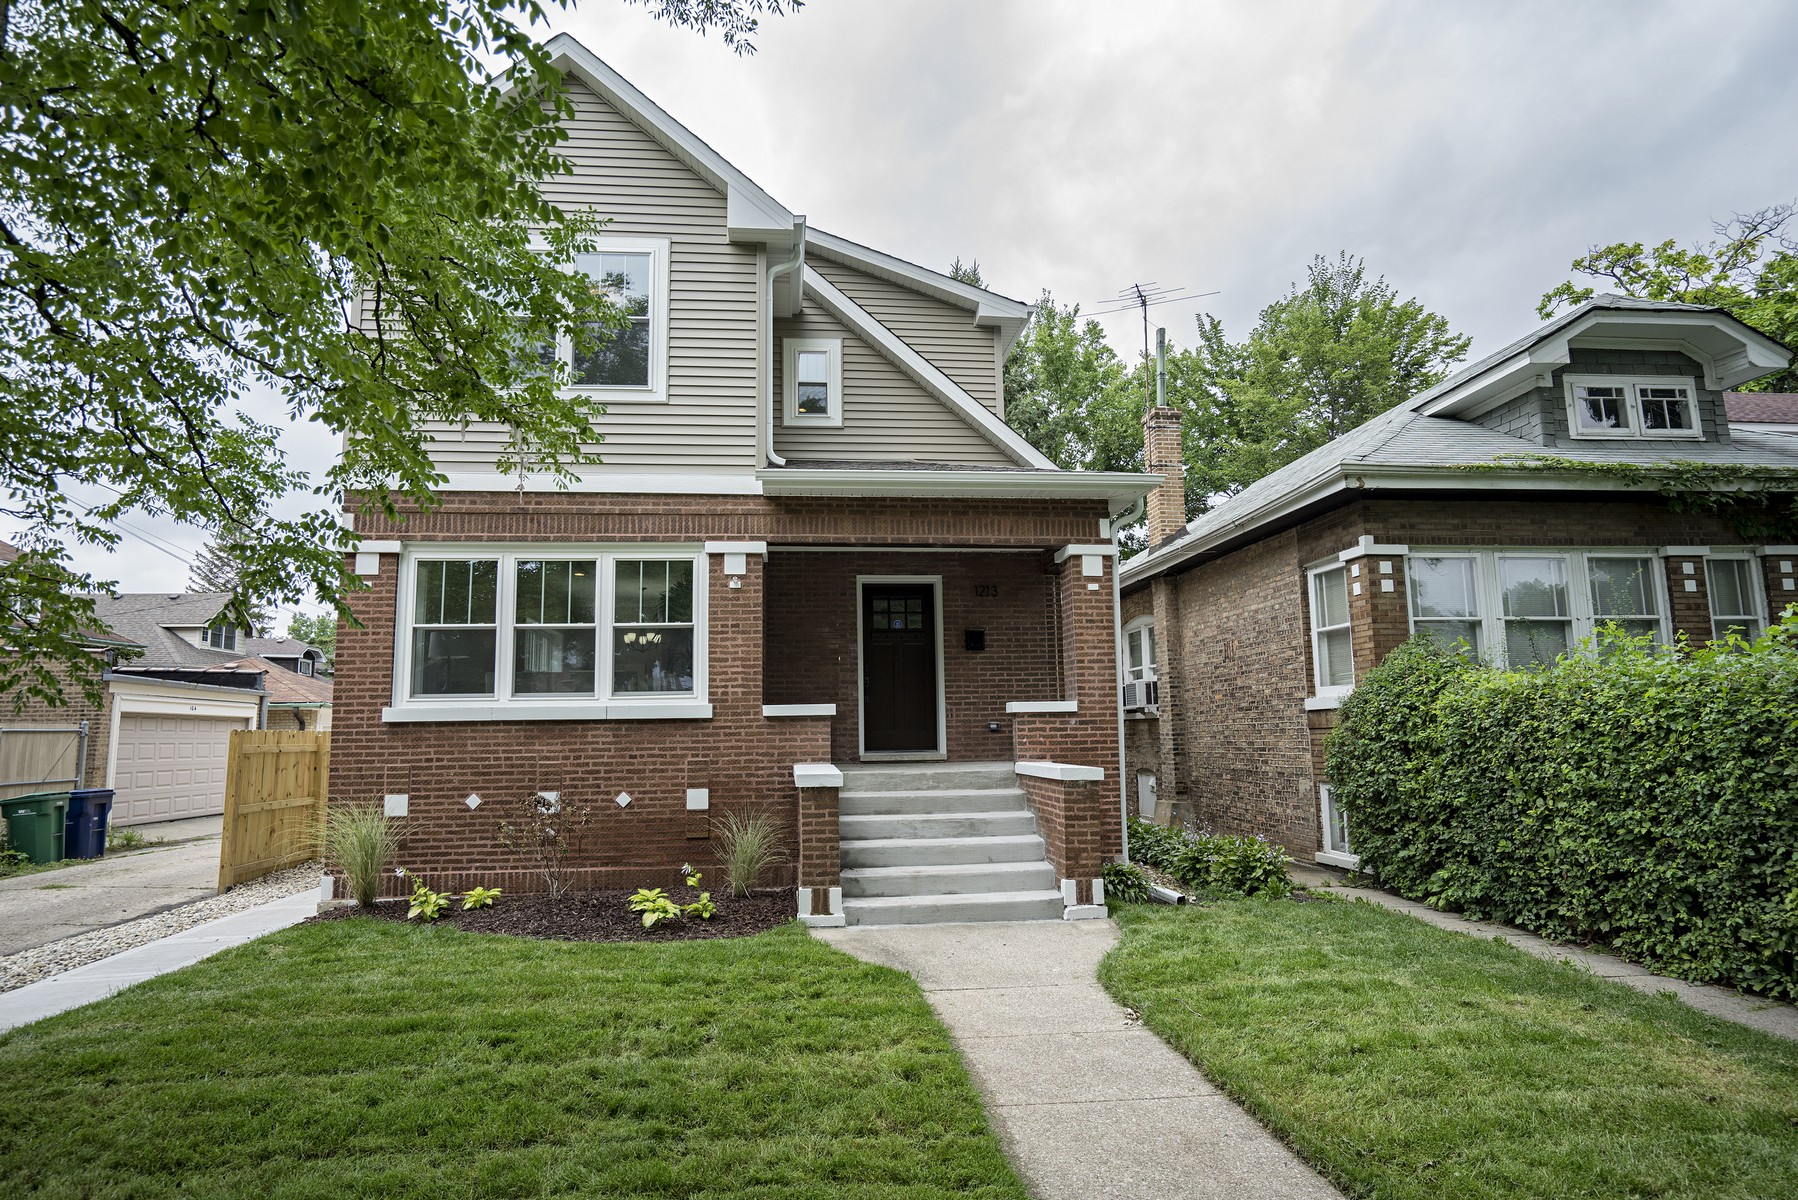 Casa para uma família para Venda às Charming Single Family Home in Oak Park 1213 N Taylor Avenue Oak Park, Illinois, 60302 Estados Unidos